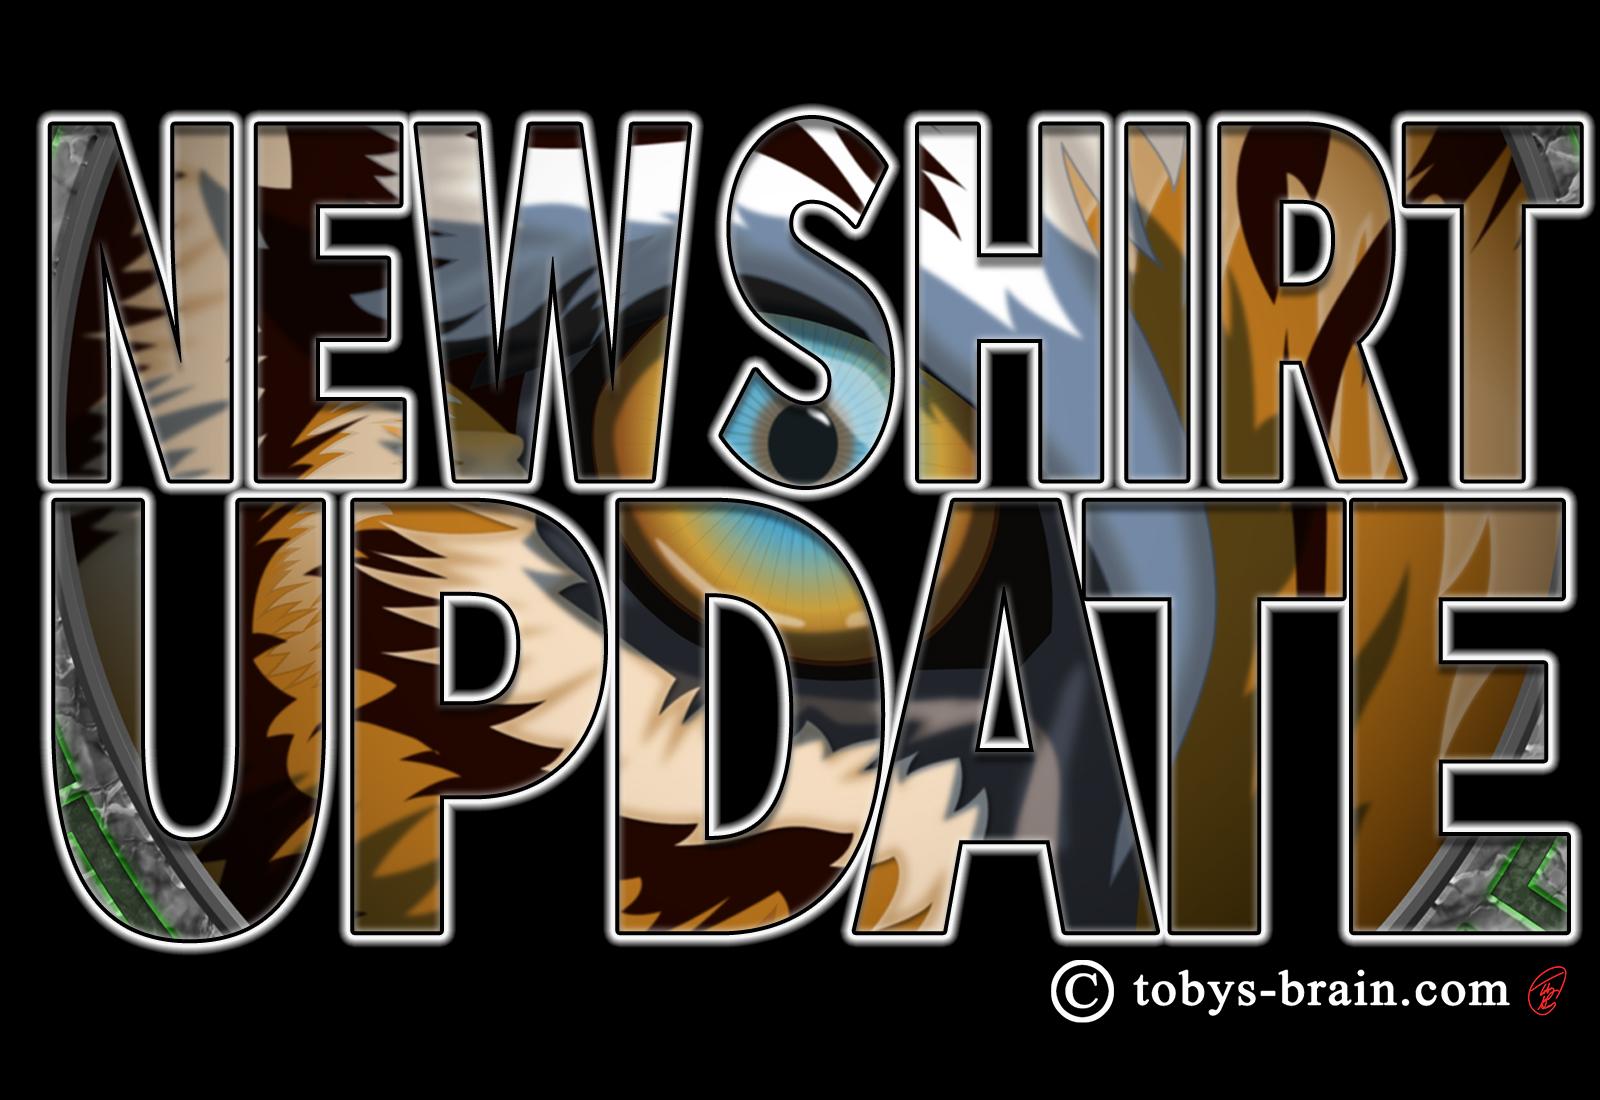 New Shirt Alert: Eye of the Tiger 2.0